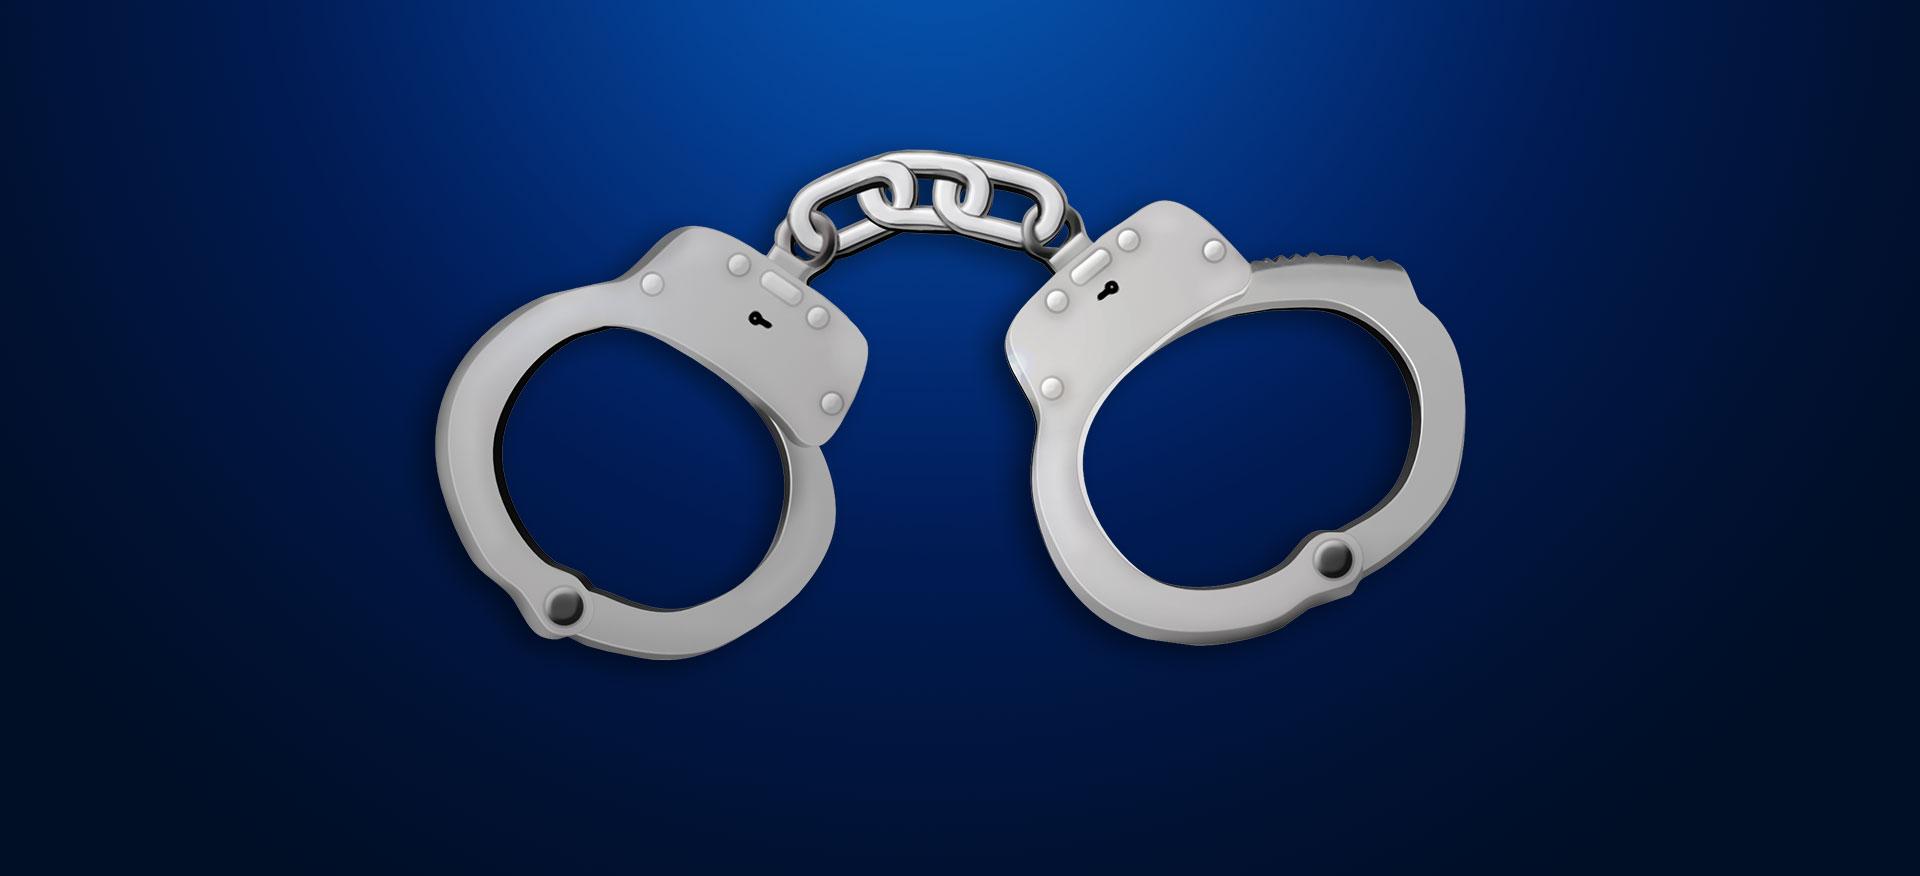 KELO Handcuffs